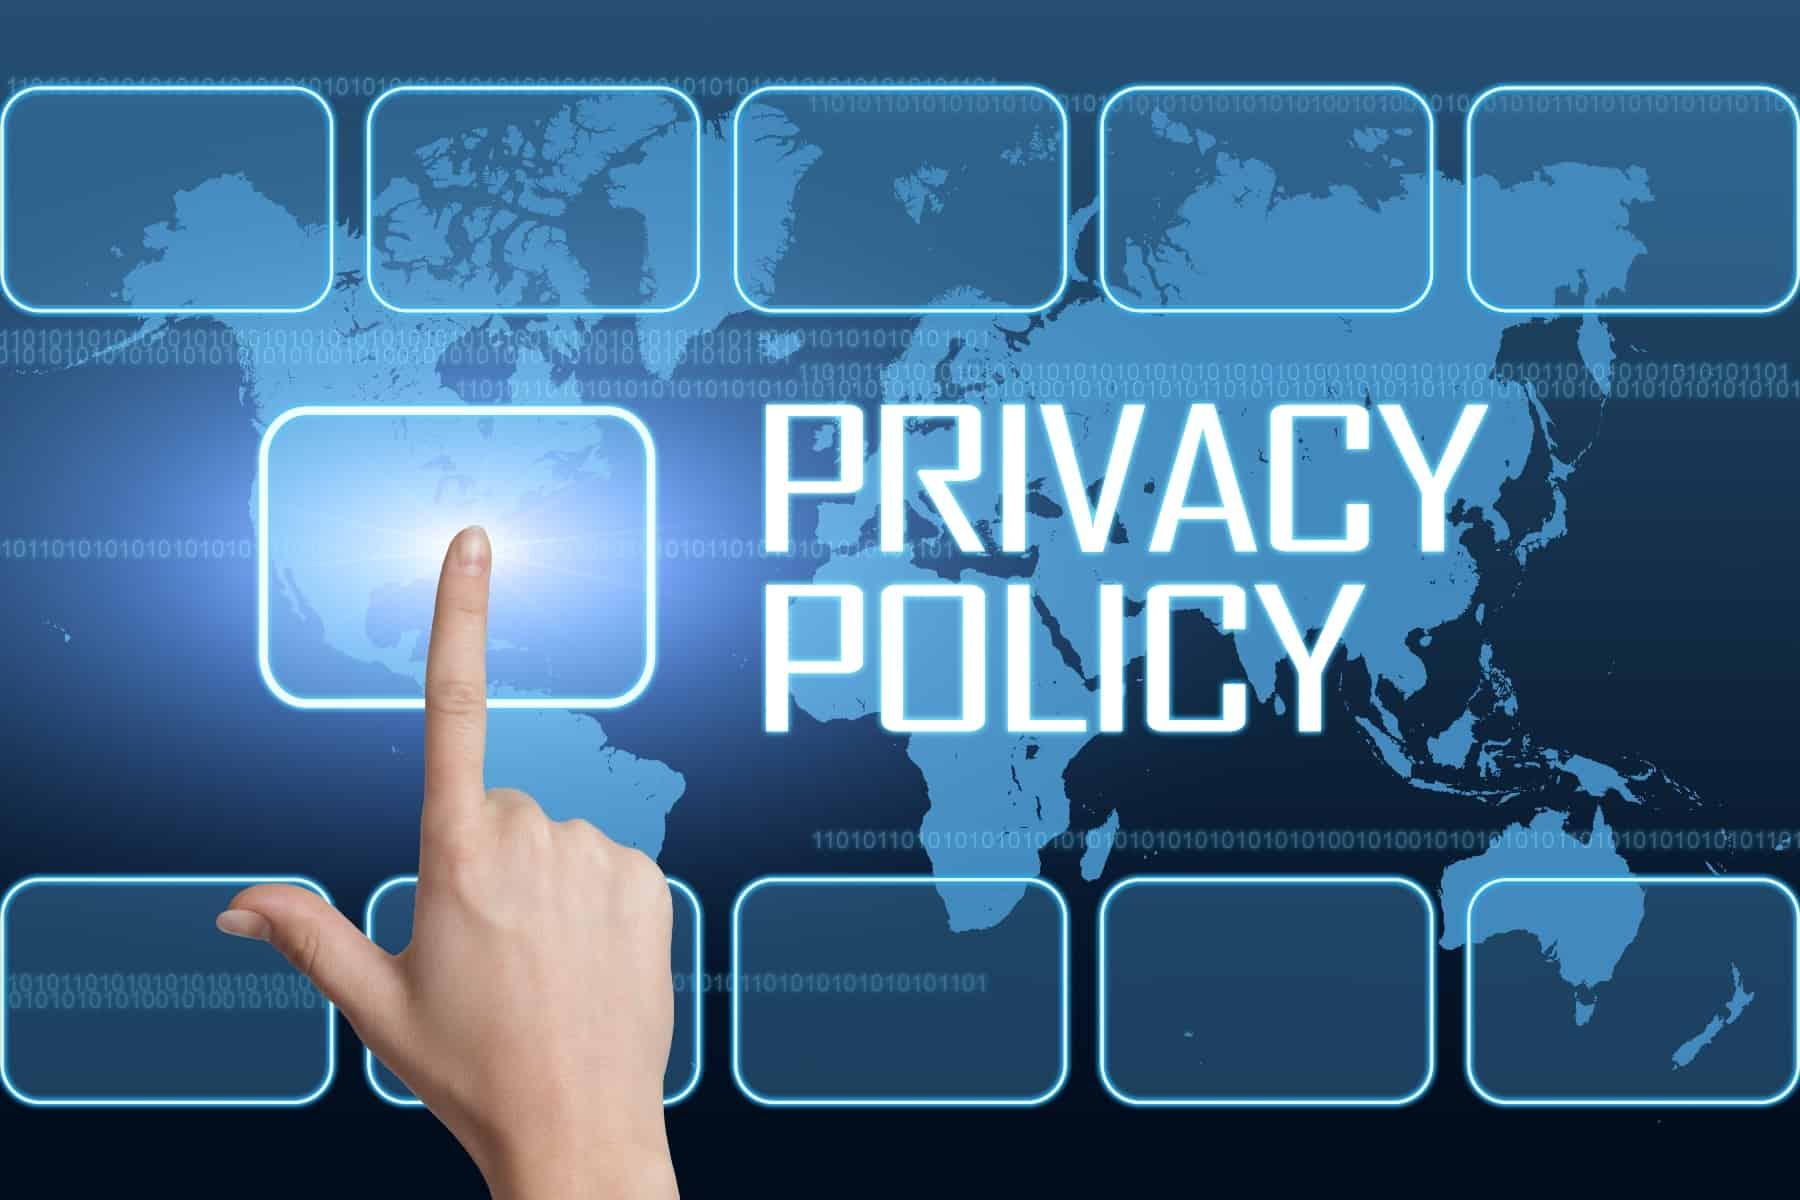 Gratis Personverns Erklæring Mal – GDPR Føyelig